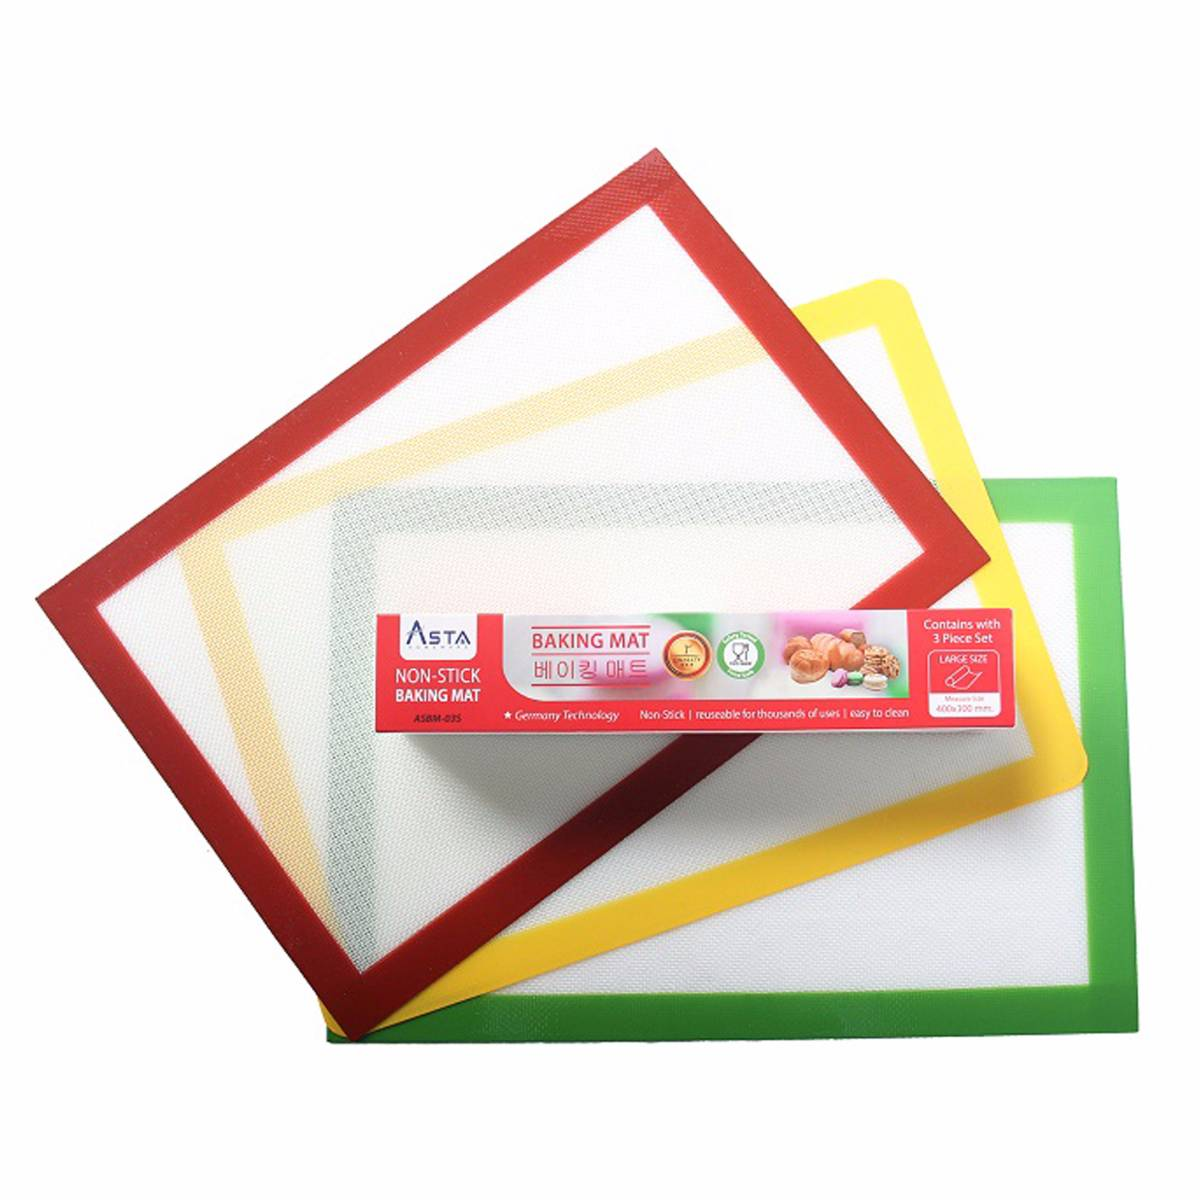 Asta Homeware Baking Mat / Silpat / Silmat / Silicone Non-stick ( 3 Pcs In 1 Box )3